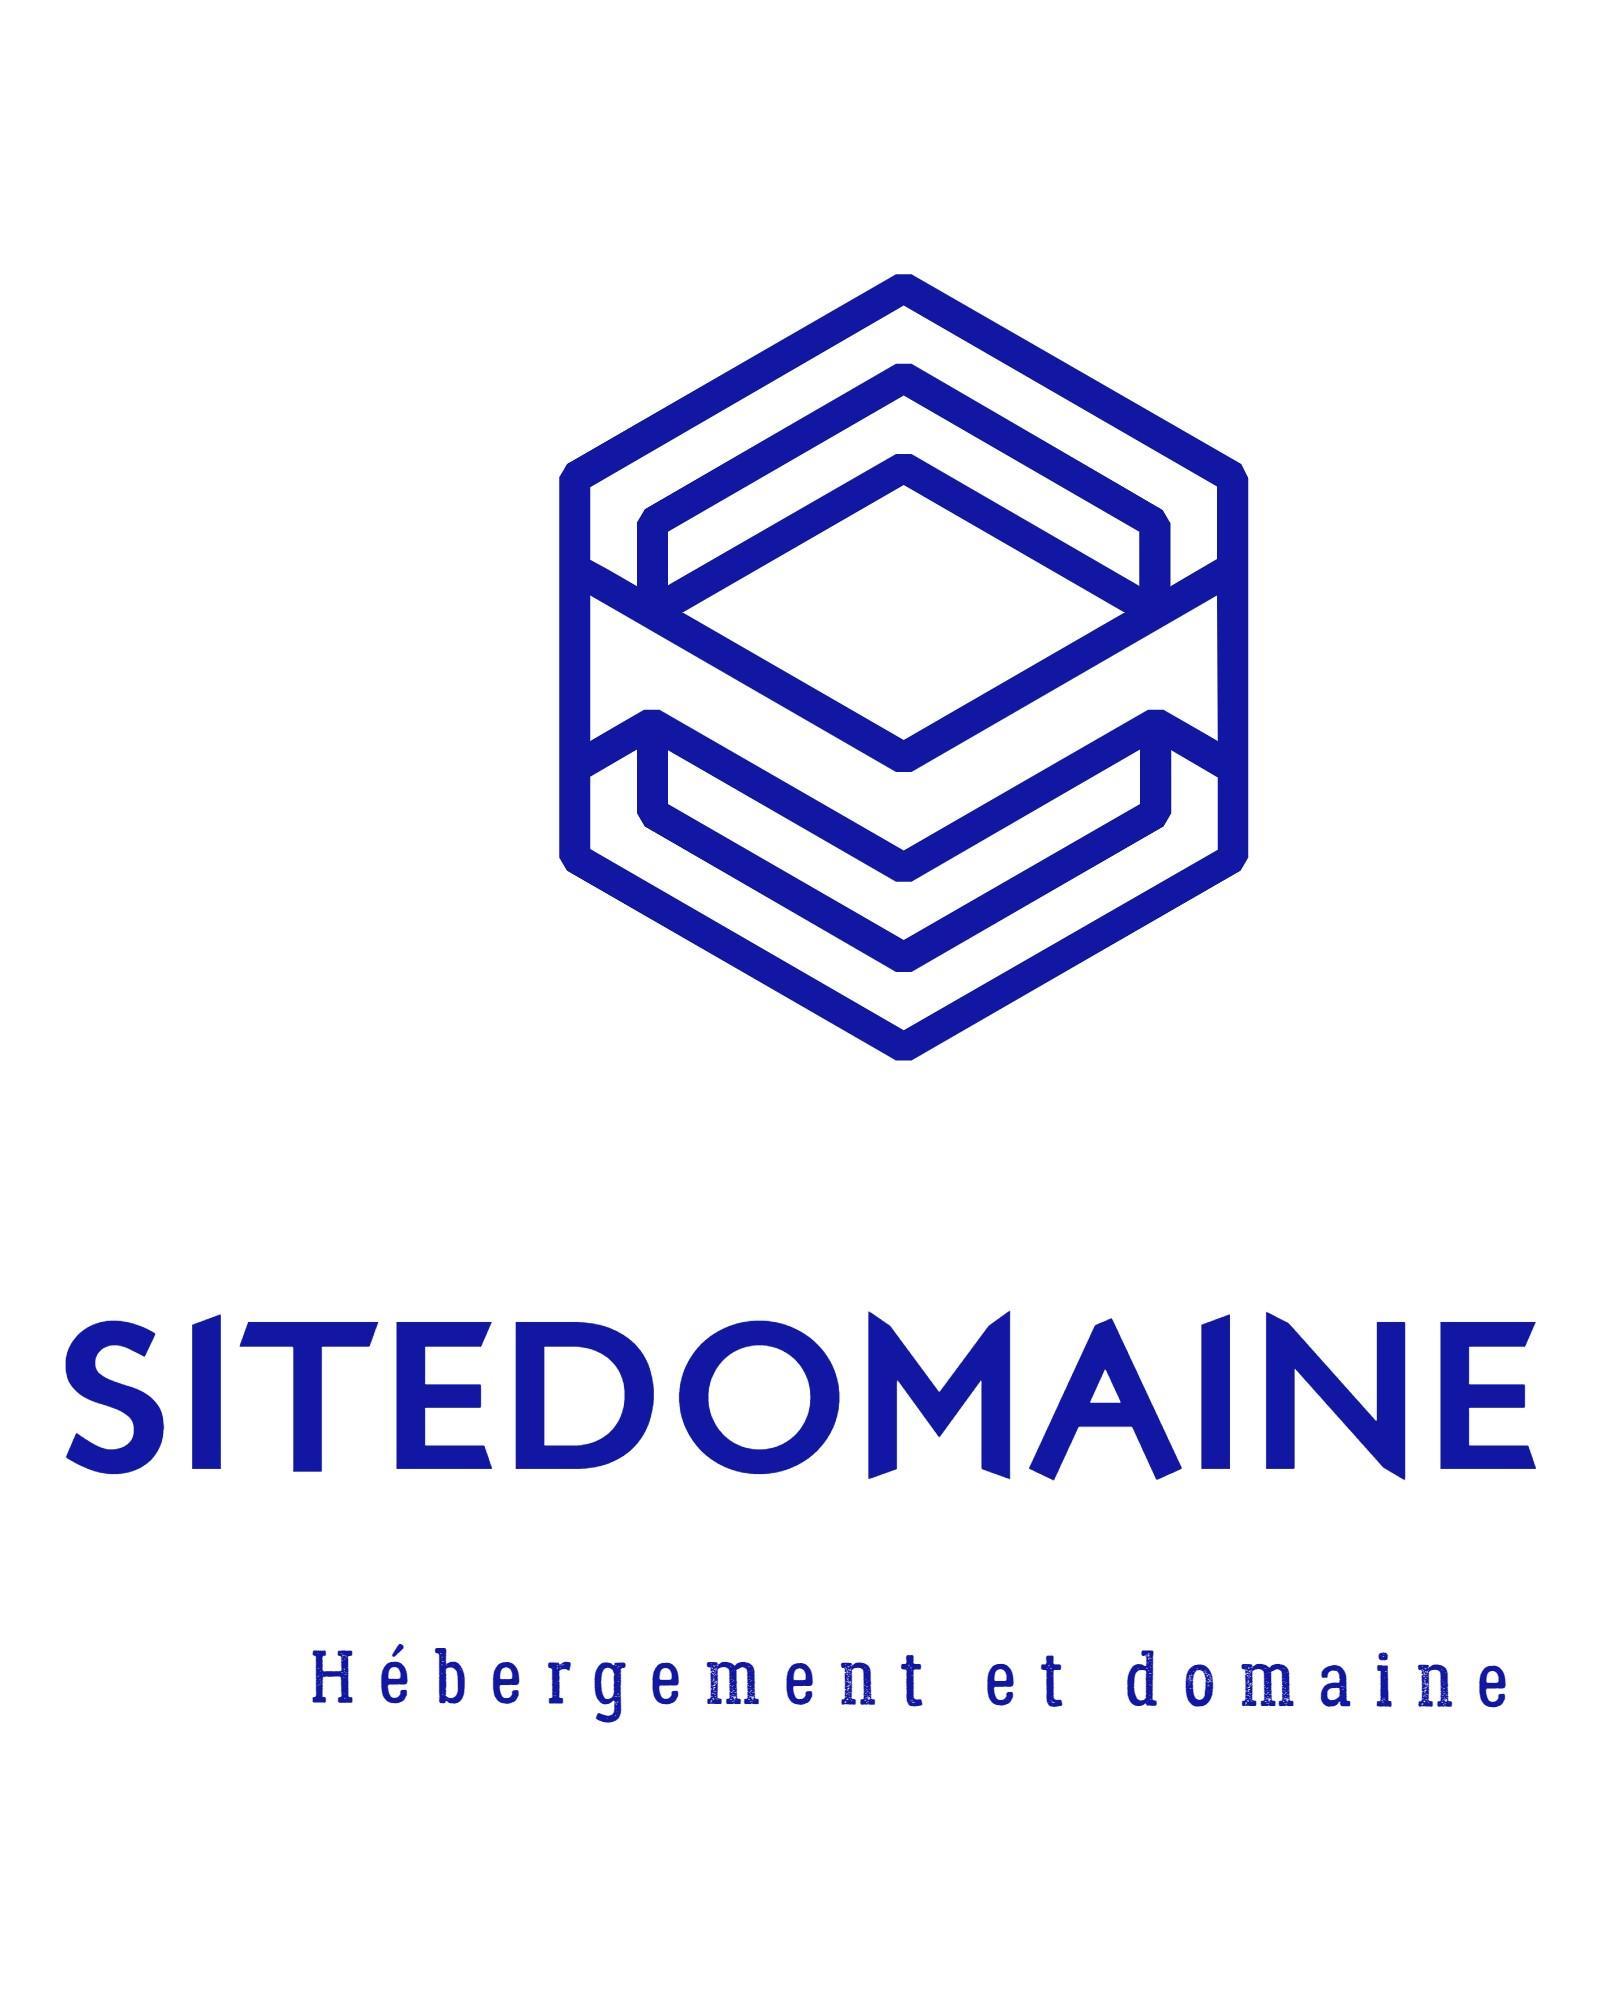 sitedomaine.com